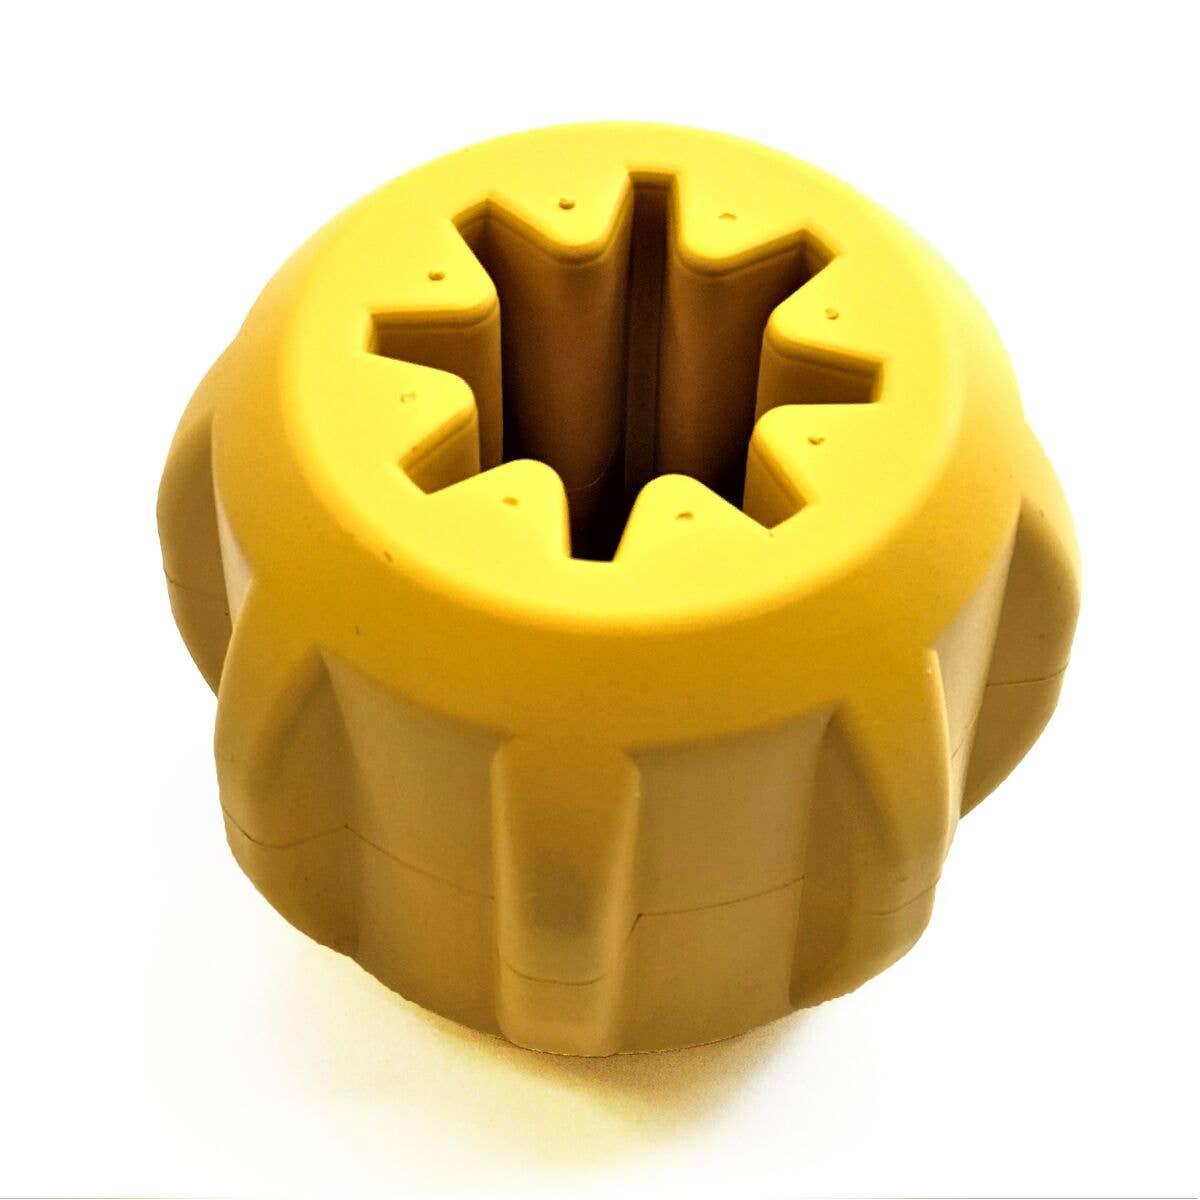 ID Gear - Chew Toy - Treat Pocket- Large - Yellow   Trada Marketplace